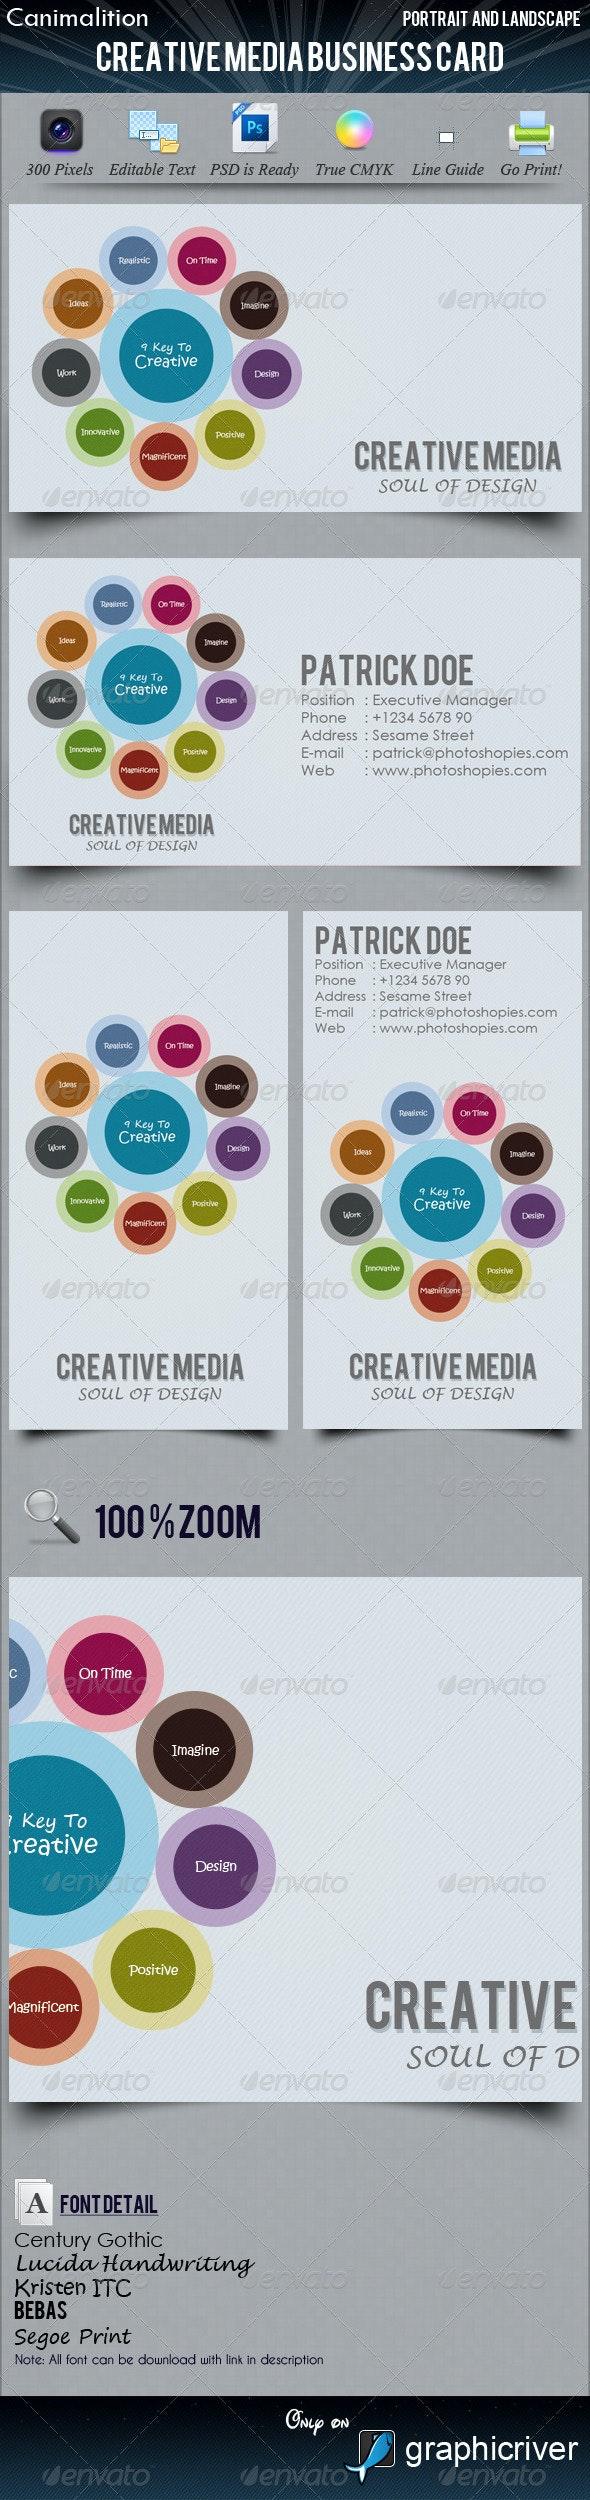 Creative Media Business Cards - Creative Business Cards